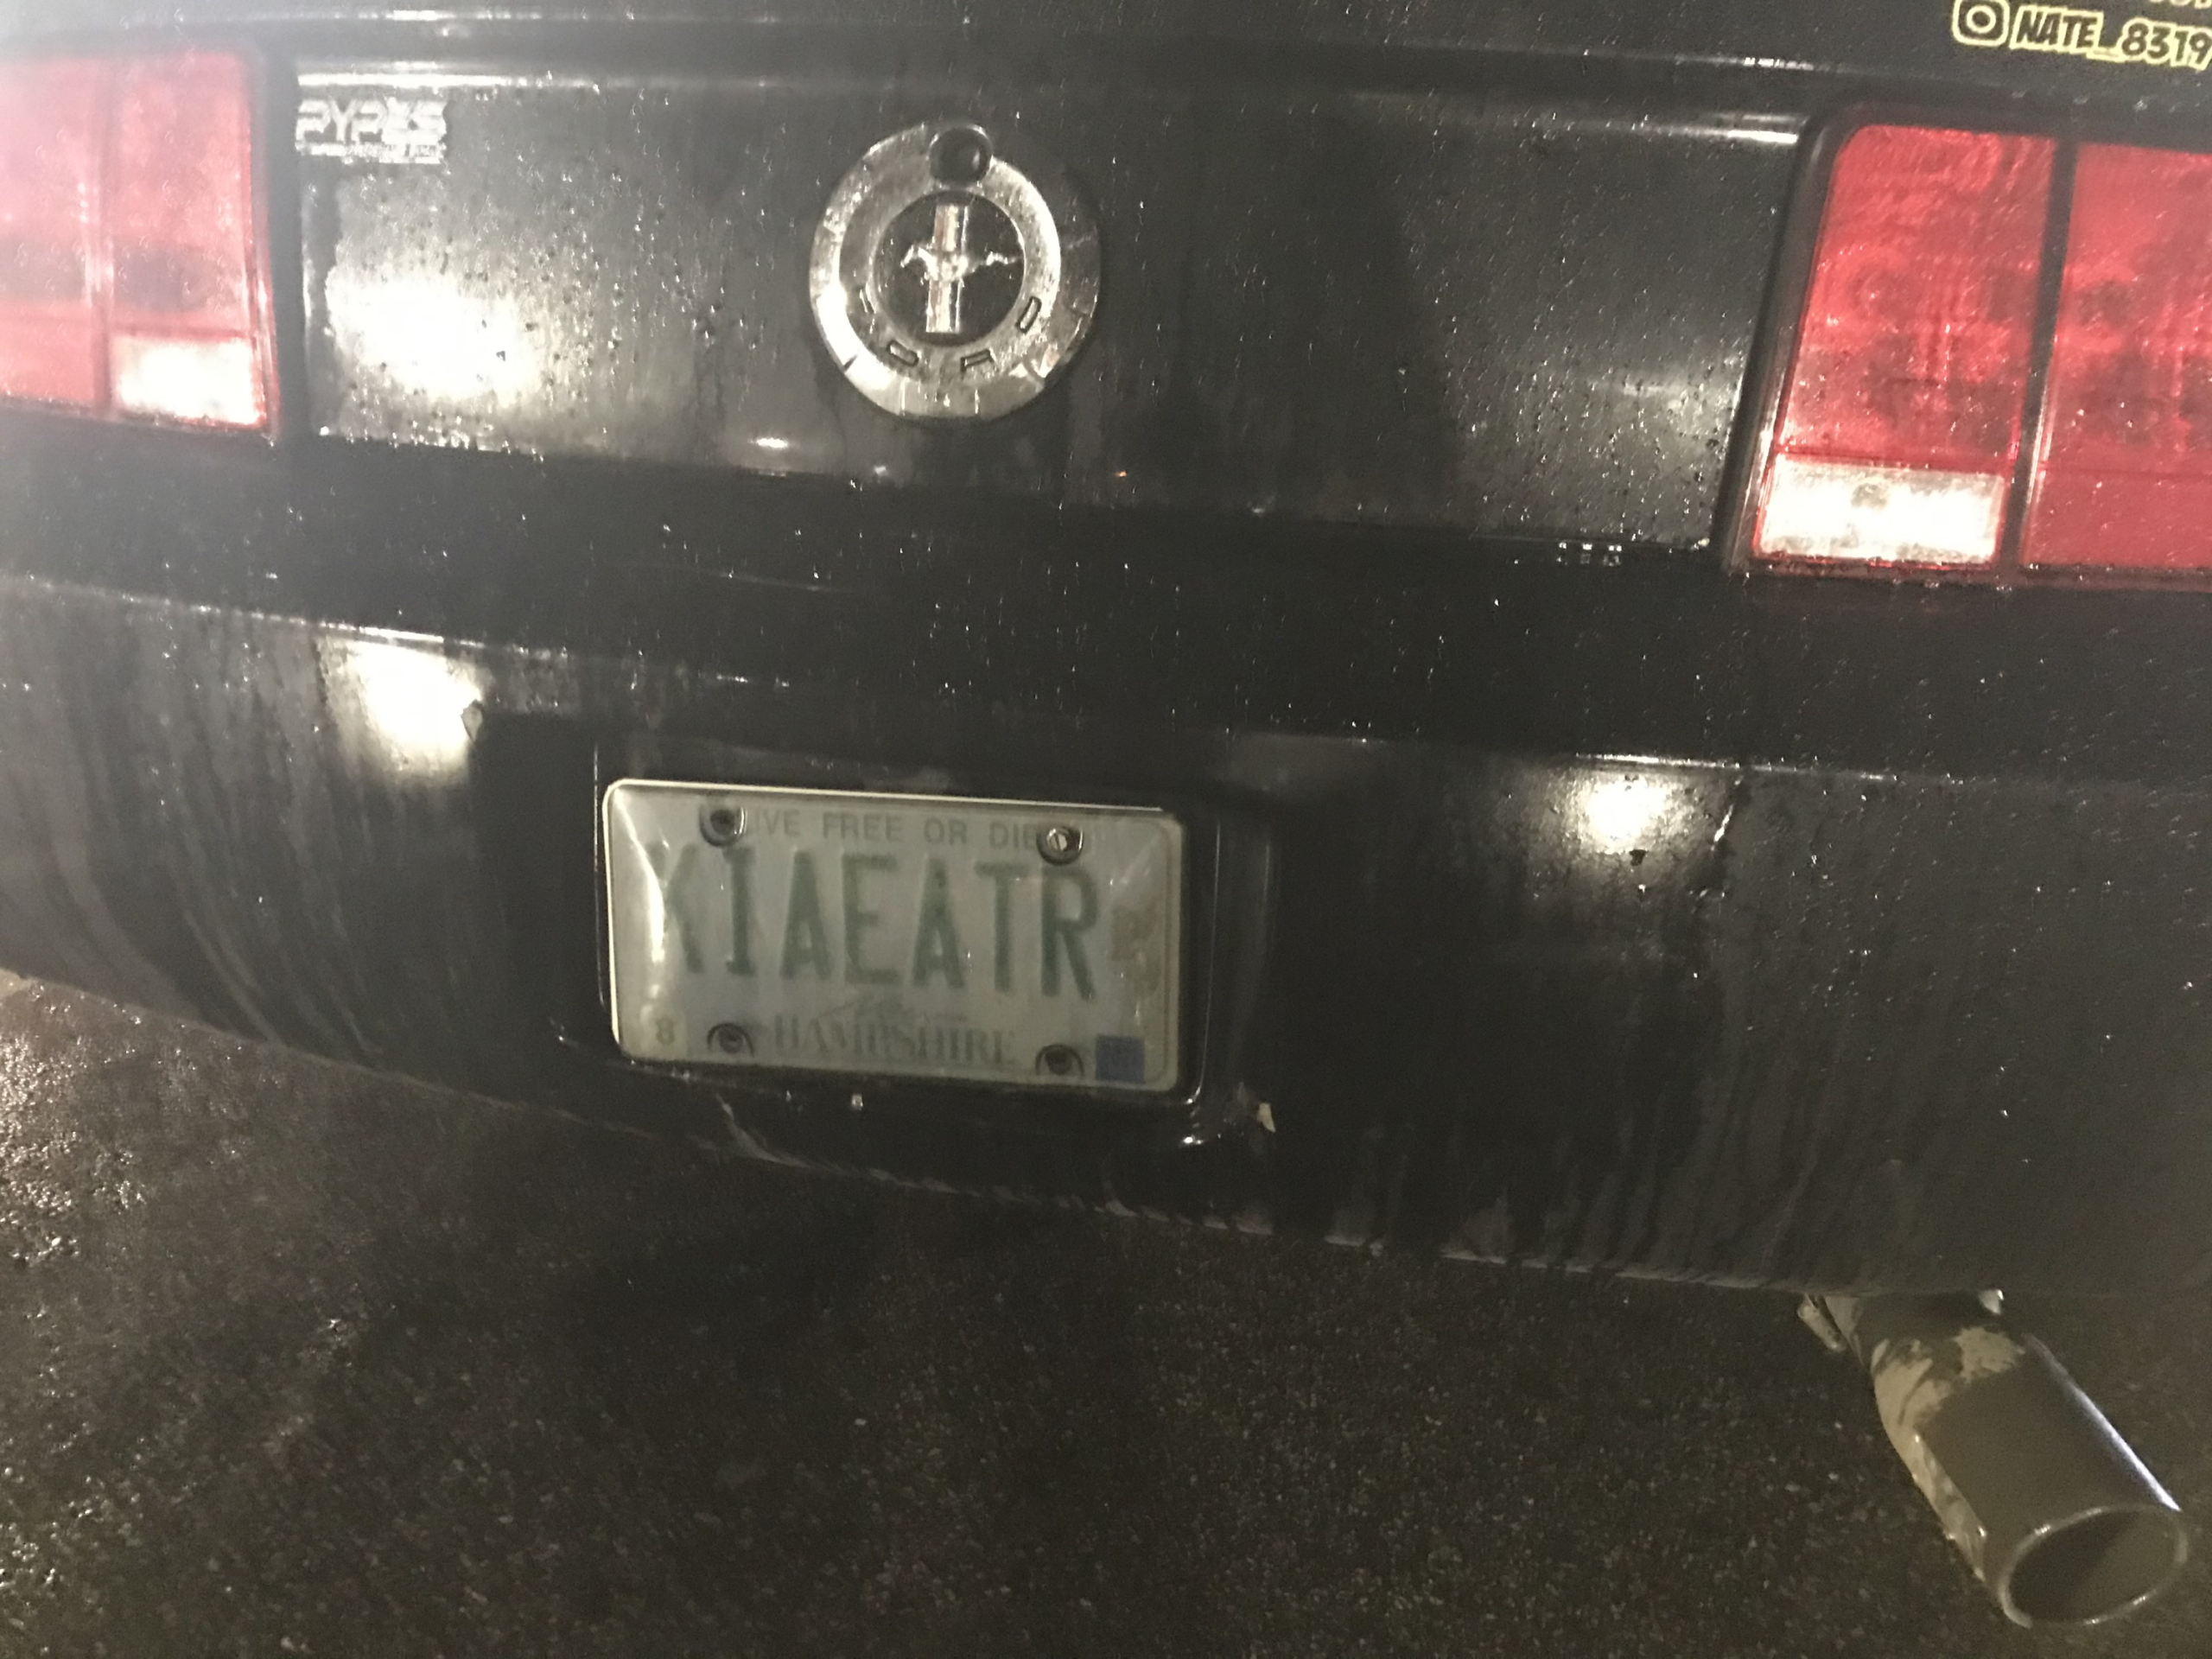 liaeatr, mustang, kia eater, license plate